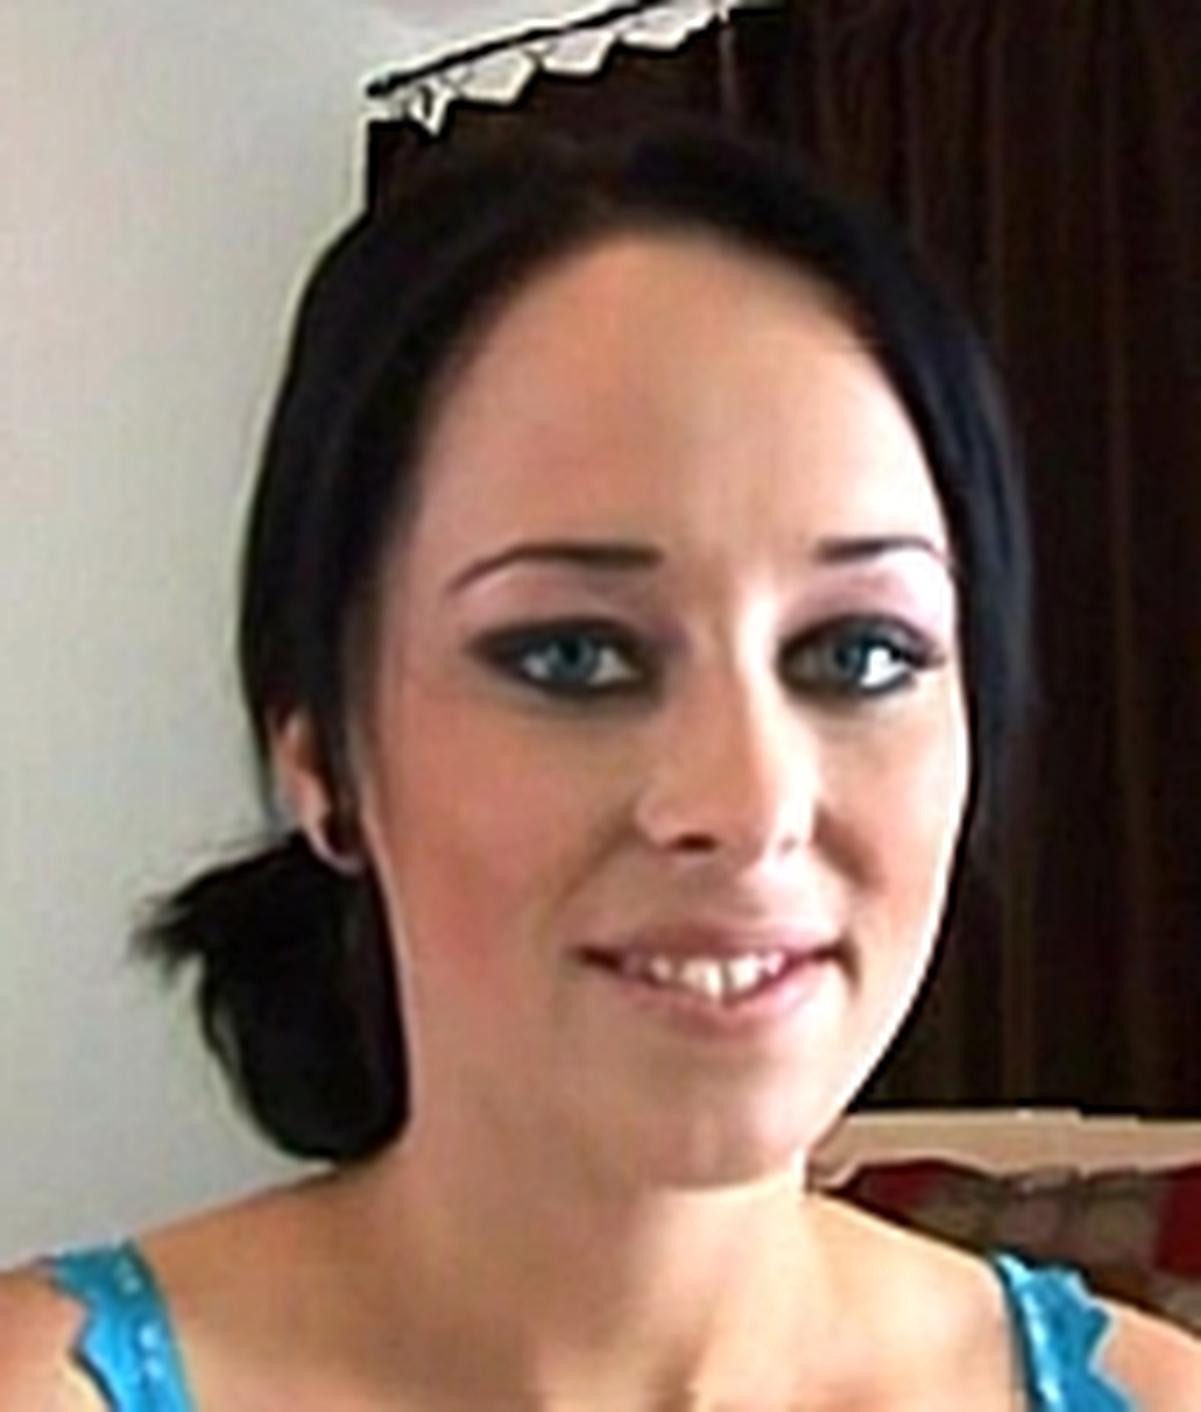 Alexa Von Porn alexa von tess wiki & bio - pornographic actress